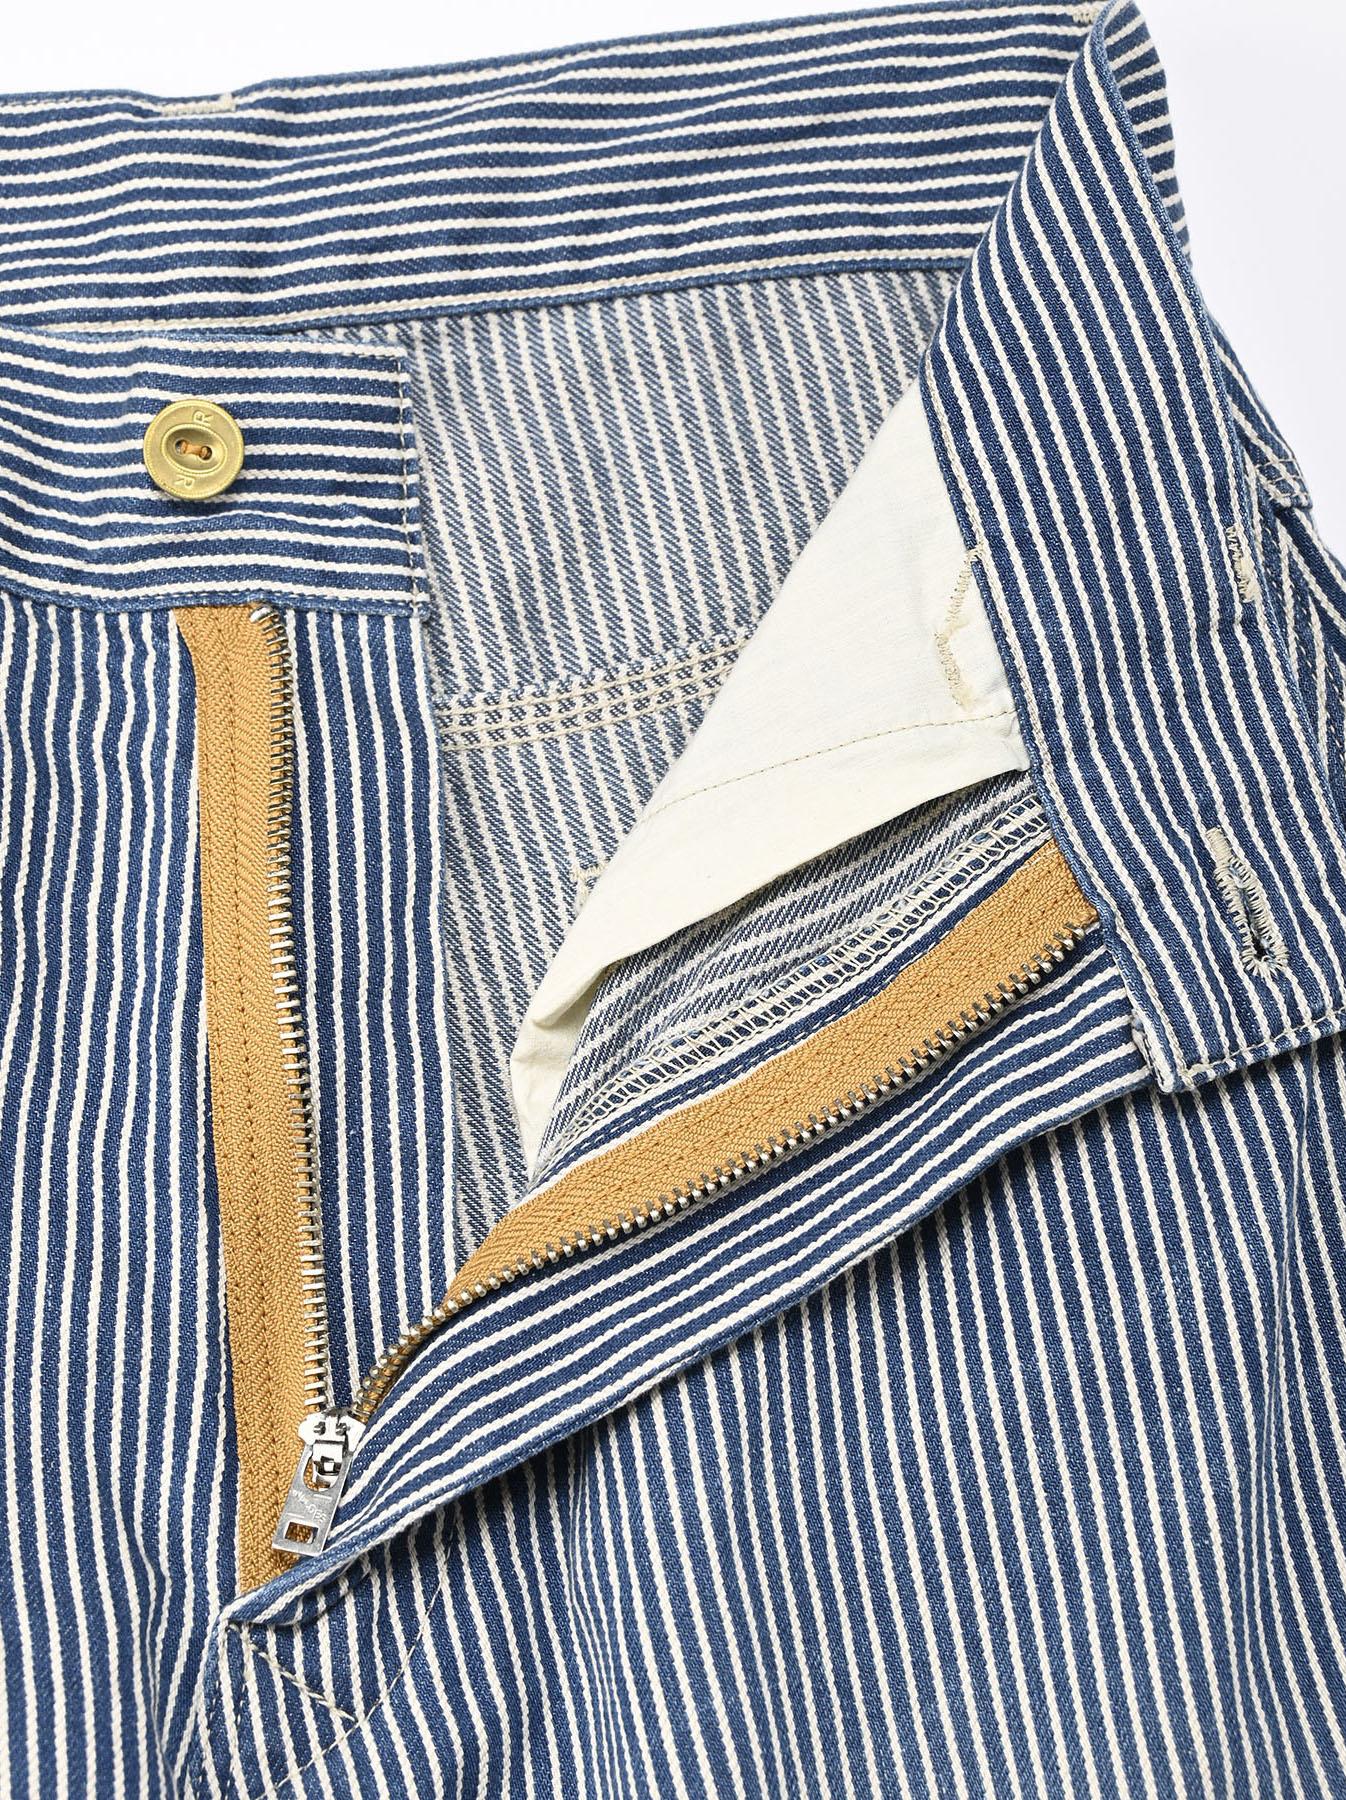 Indigo 908 Painter Pants Distressed (0721)-10